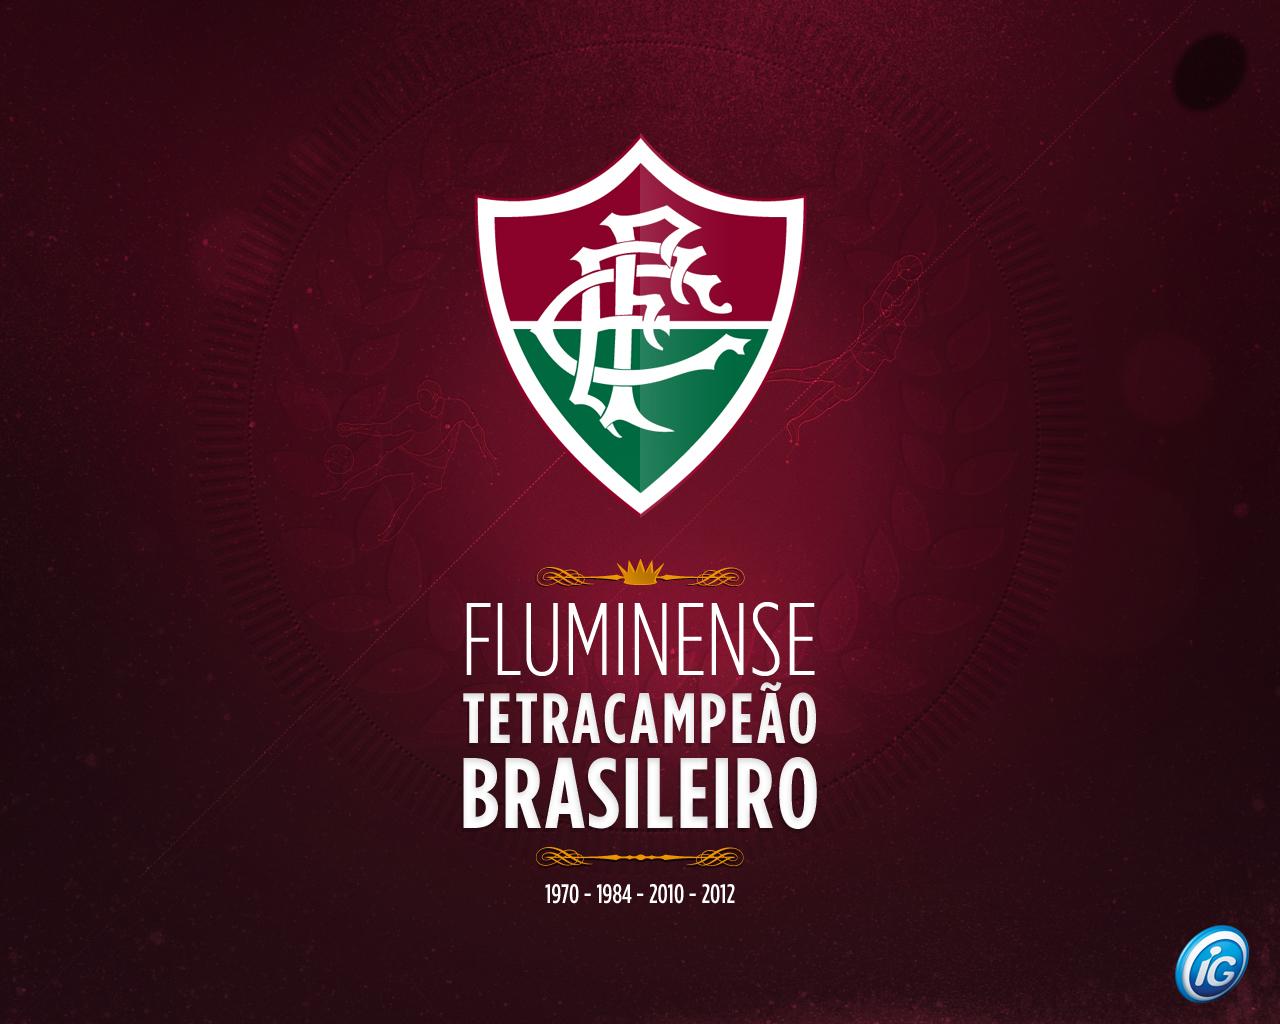 Wallpaper: Fluminense Campeão Brasileiro 2012 (1)